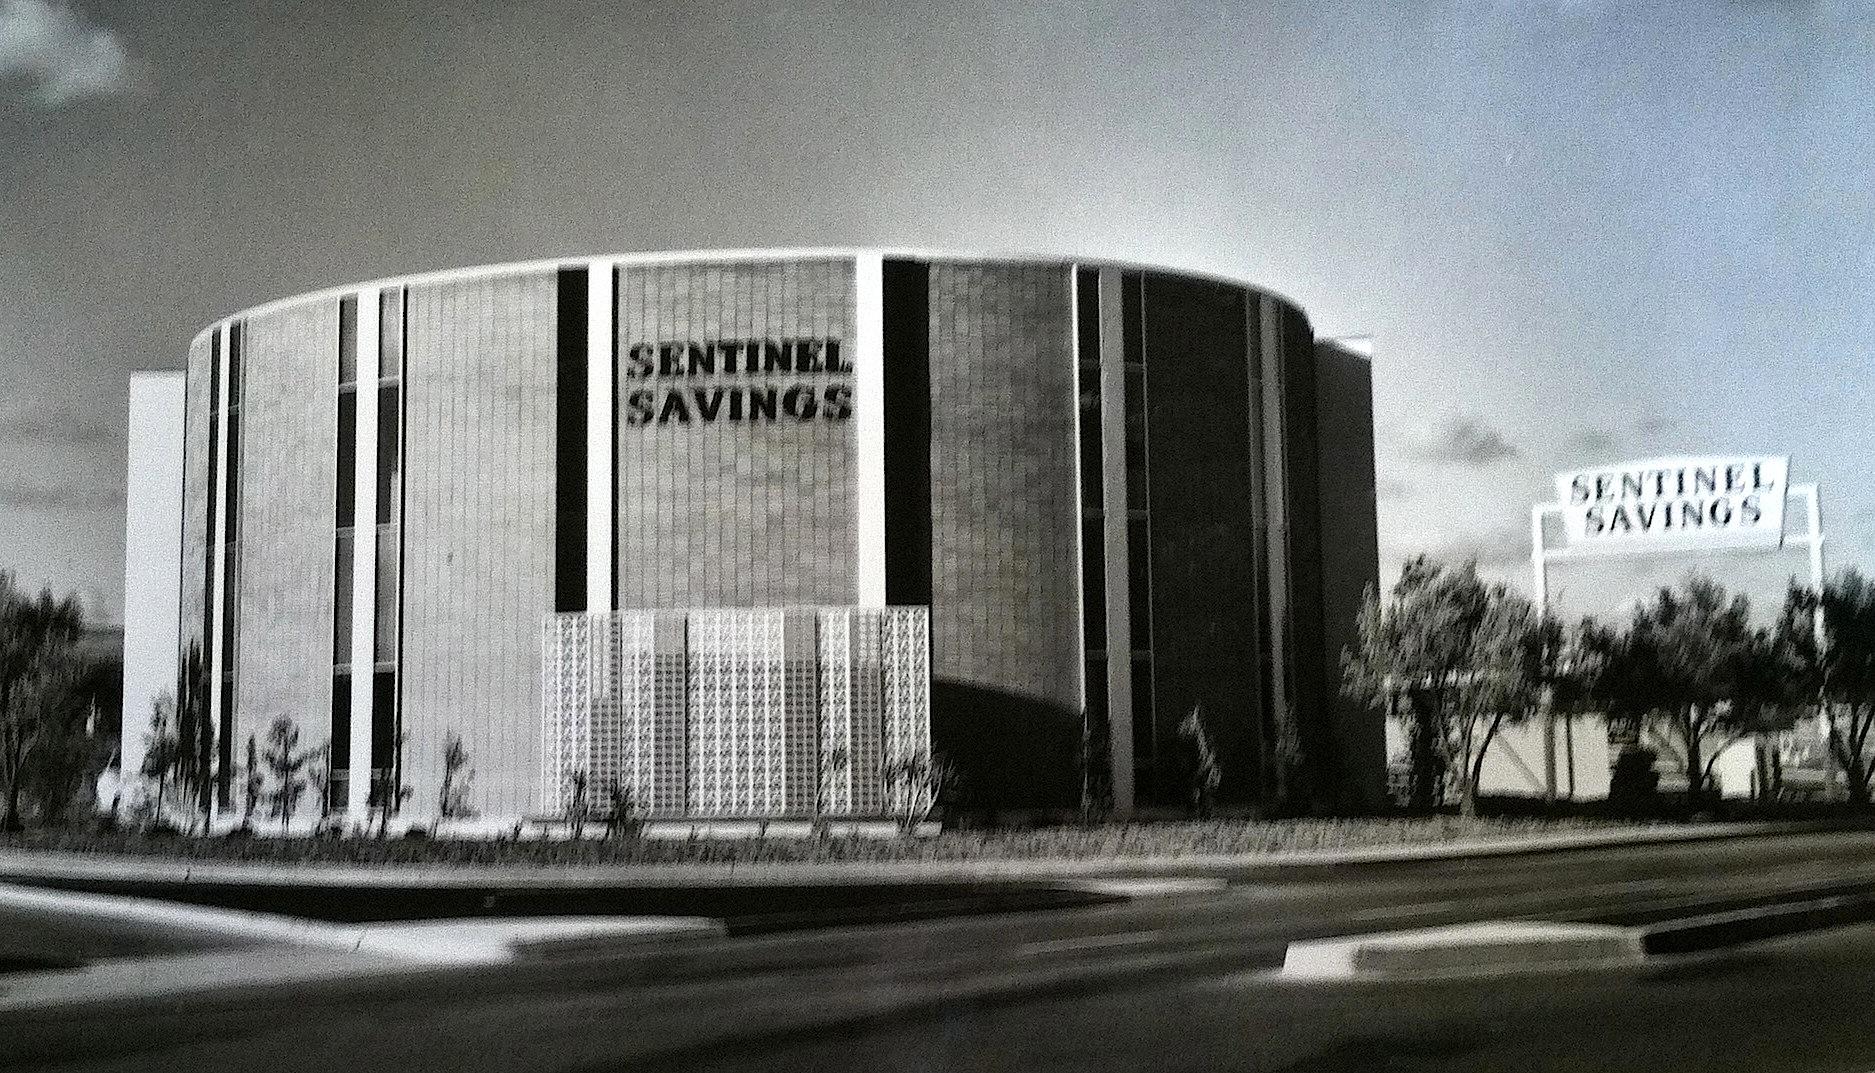 S. David Underwood, Sentinel Savings and Loan, San Diego, 1962 (demolished); S. David Underwood Archive.